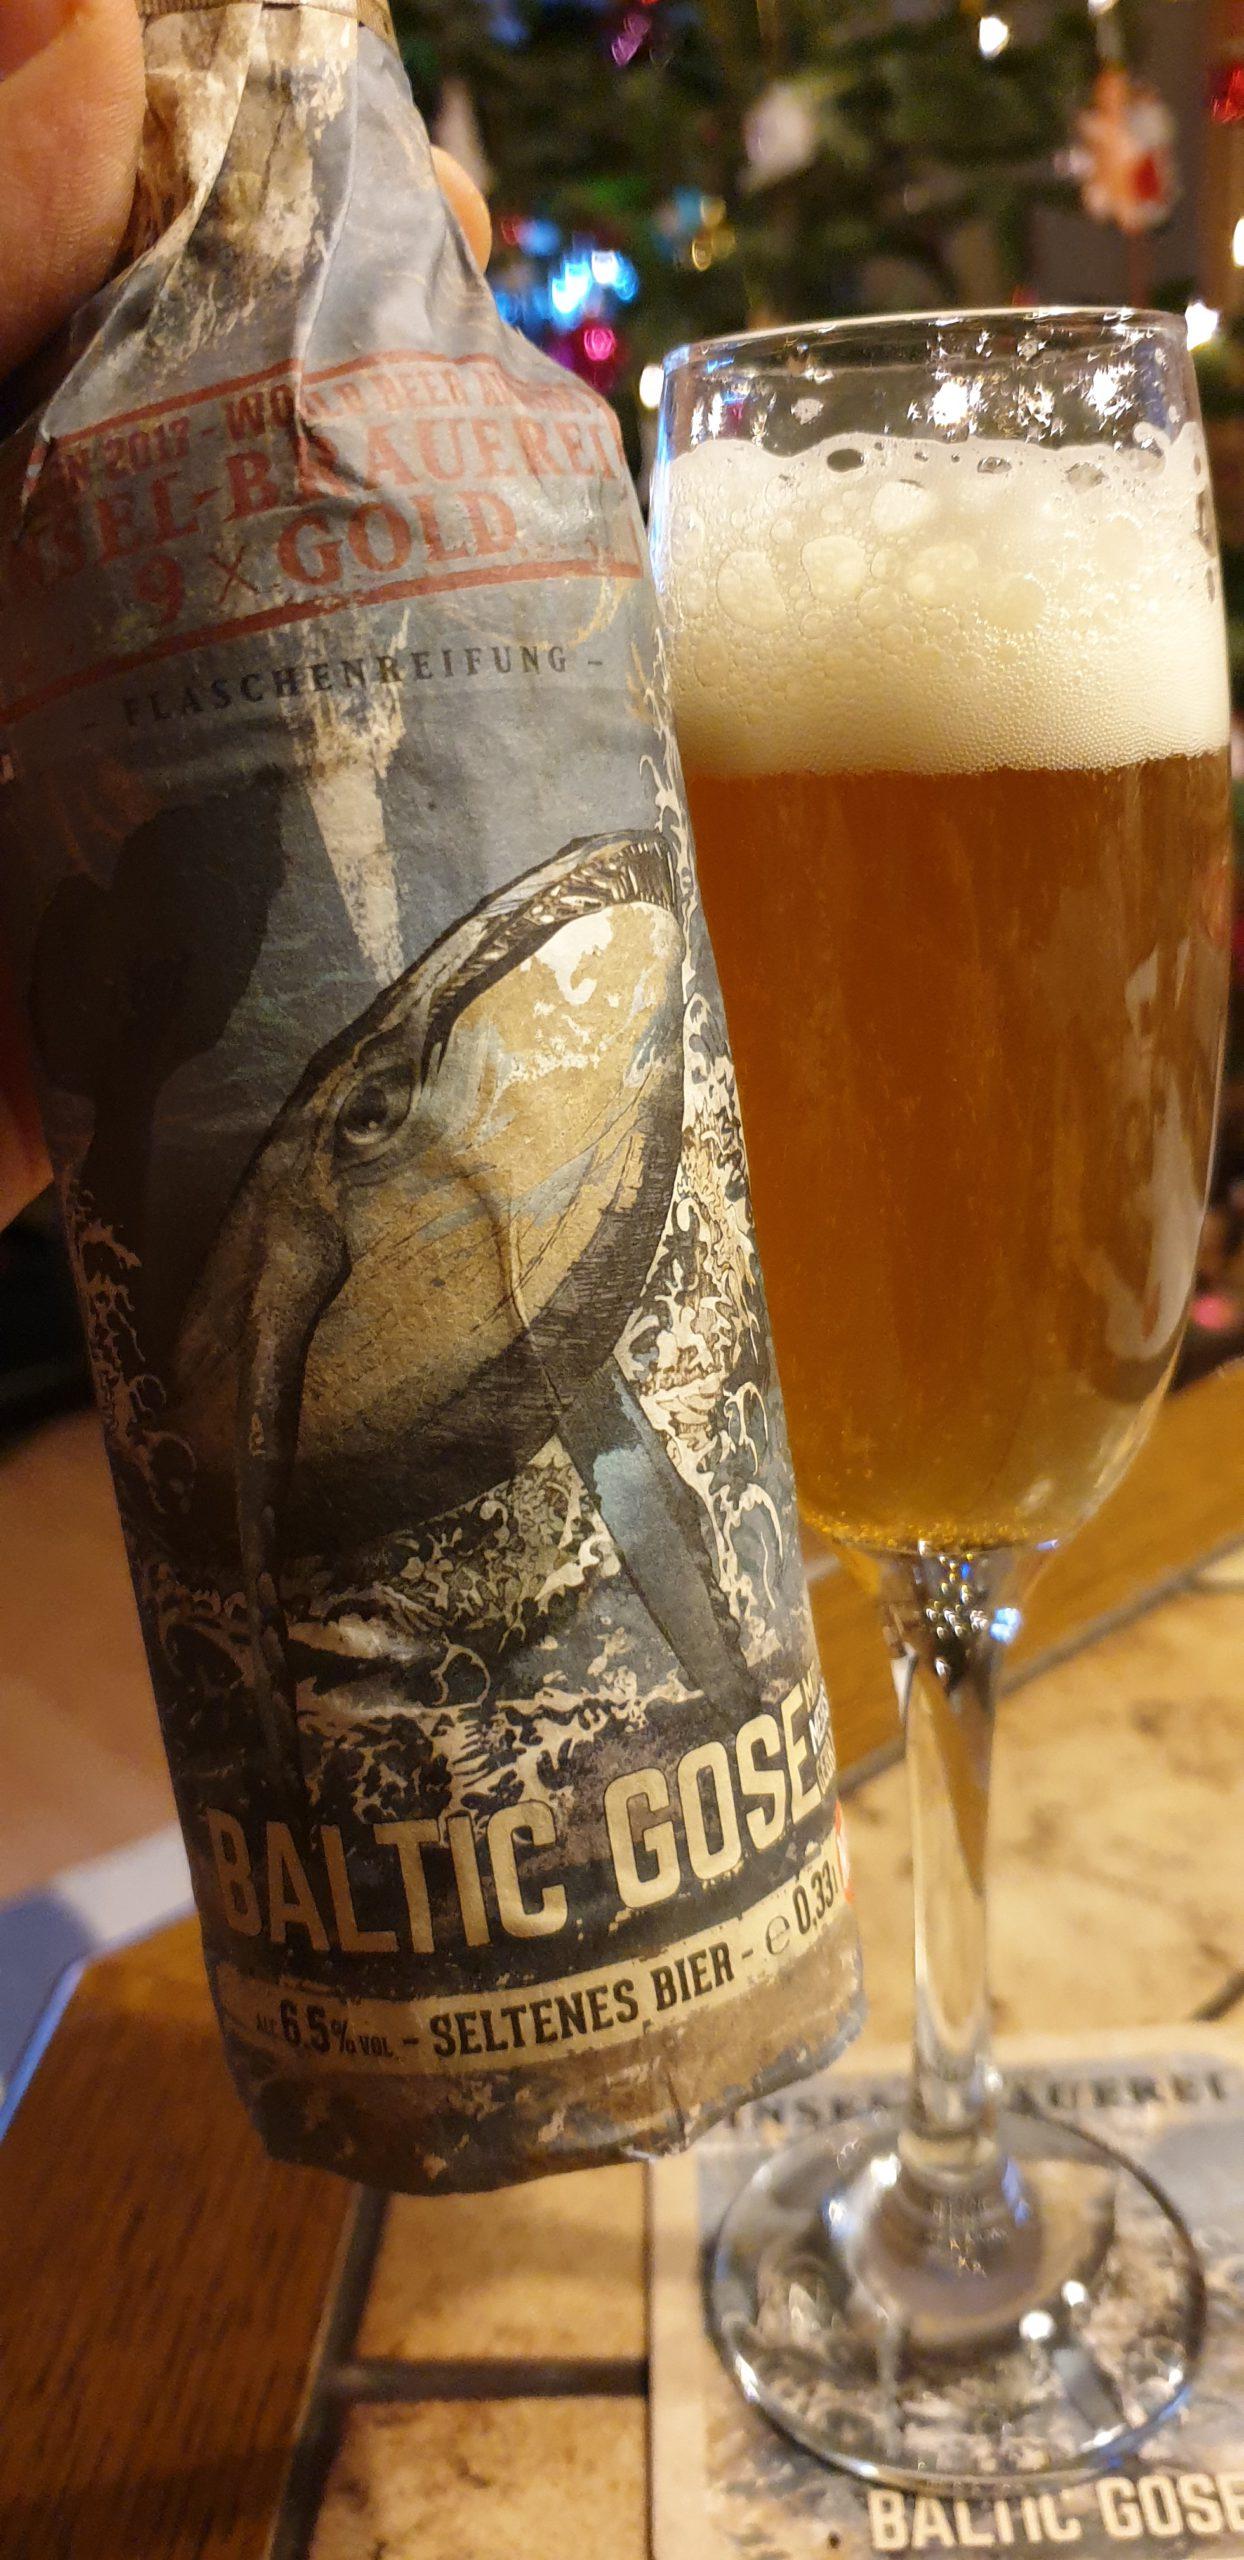 Insel-Brauerei – Baltic Gose